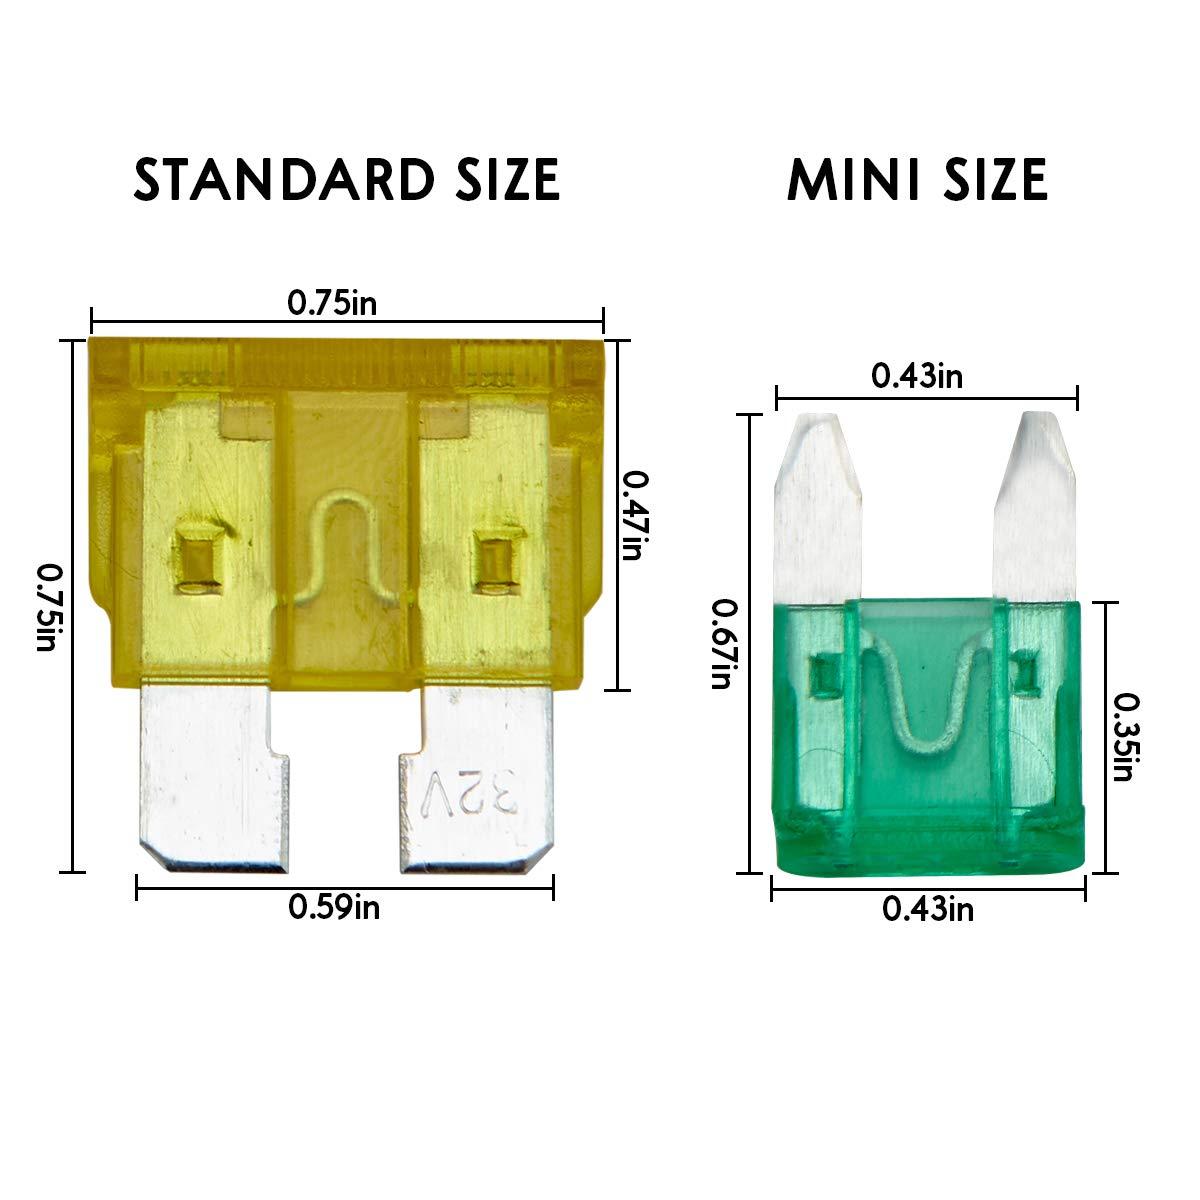 2A// 3A// 5A// 7.5A// 10A// 15A// 20A// 25A// 30A// 35A Deimcdy Car Fuse Kit 220pcs Car Fuses Assortment Standard /& Mini